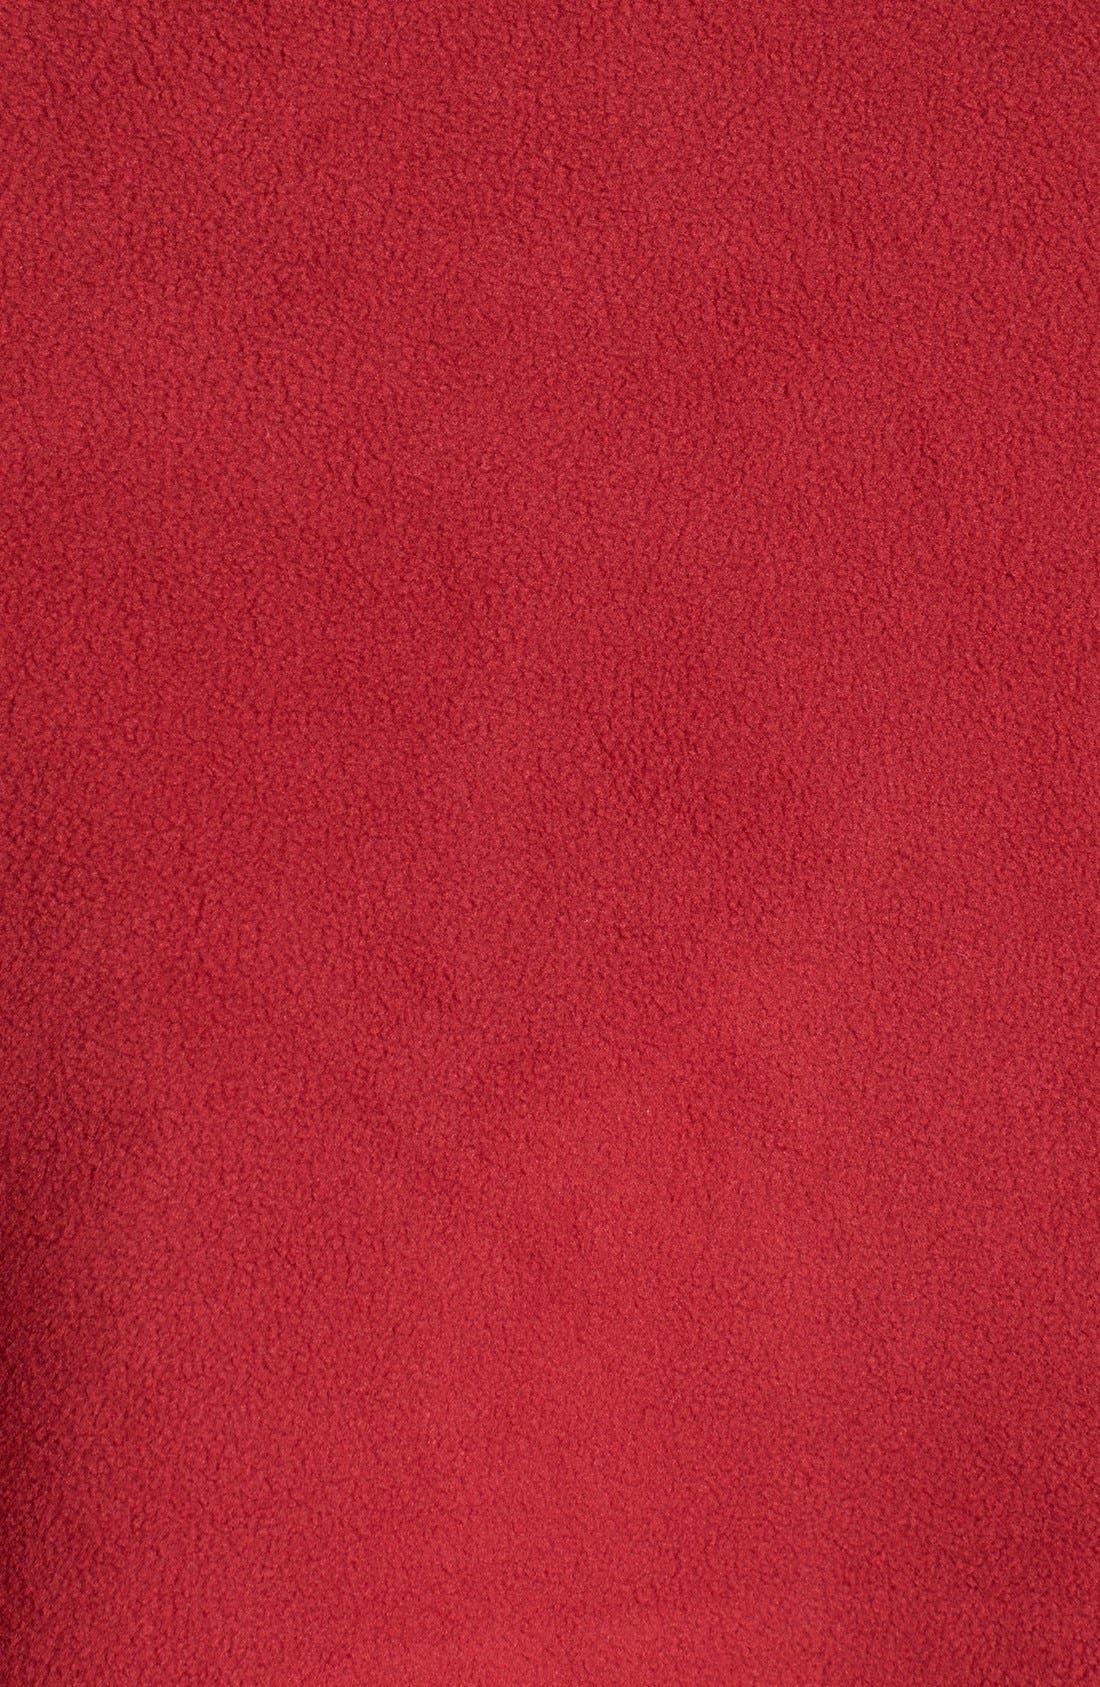 'Chimborazo' Zip Front Fleece Jacket,                             Alternate thumbnail 30, color,